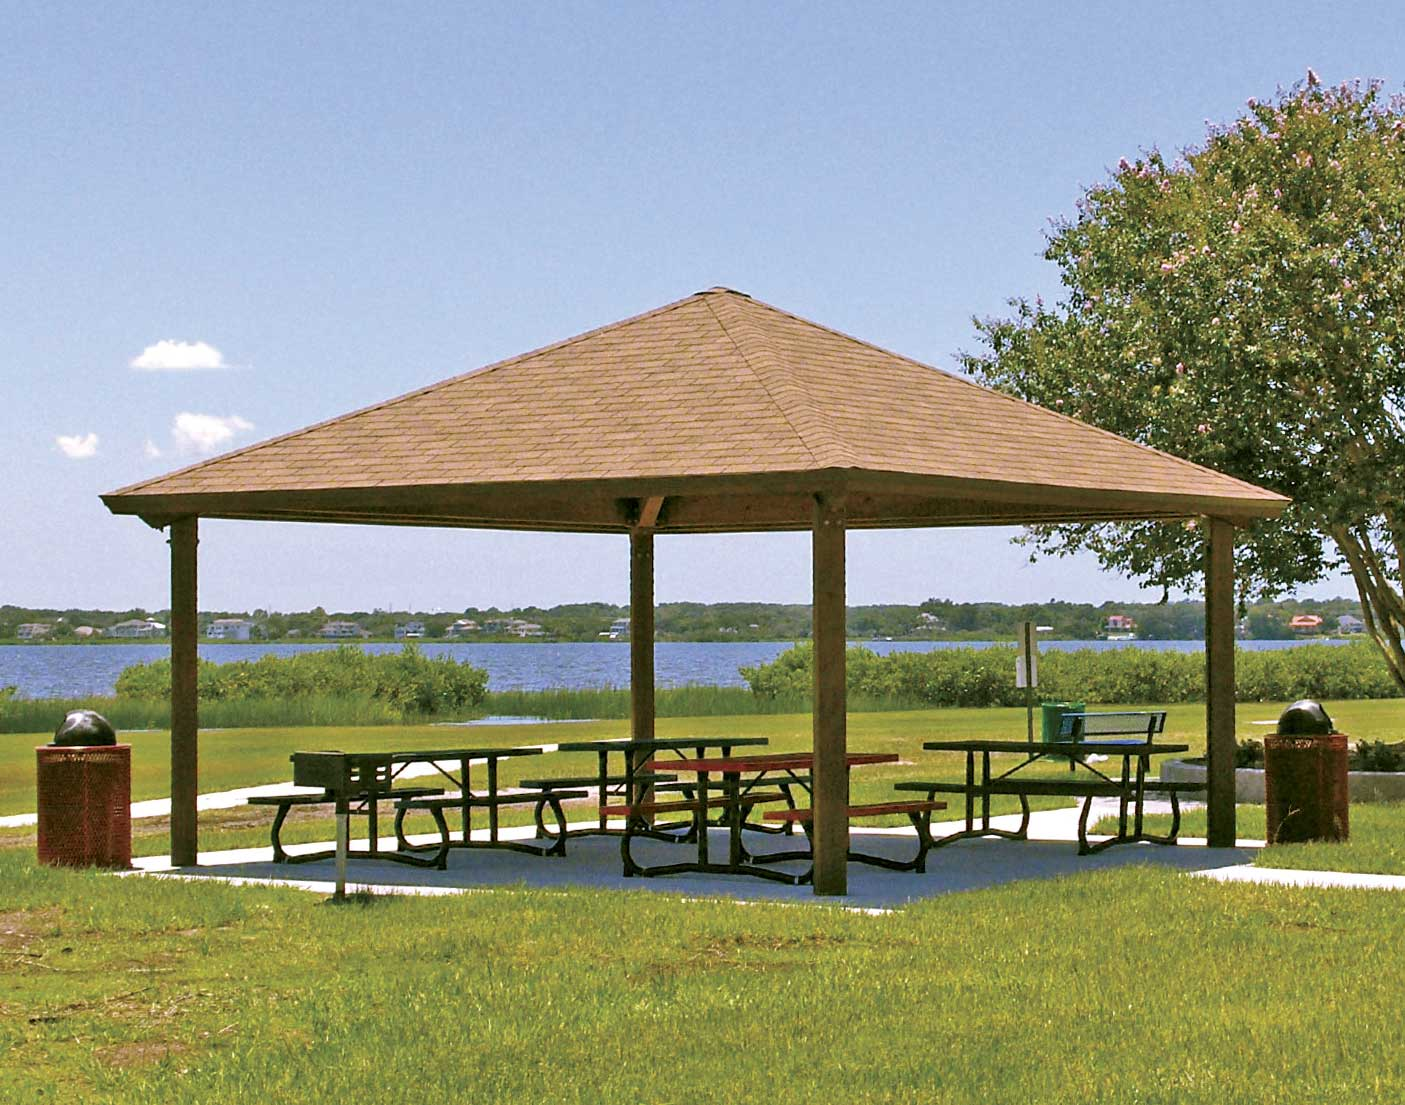 Wood single roof forestview square pavilions pavilions for 20x20 carport plans